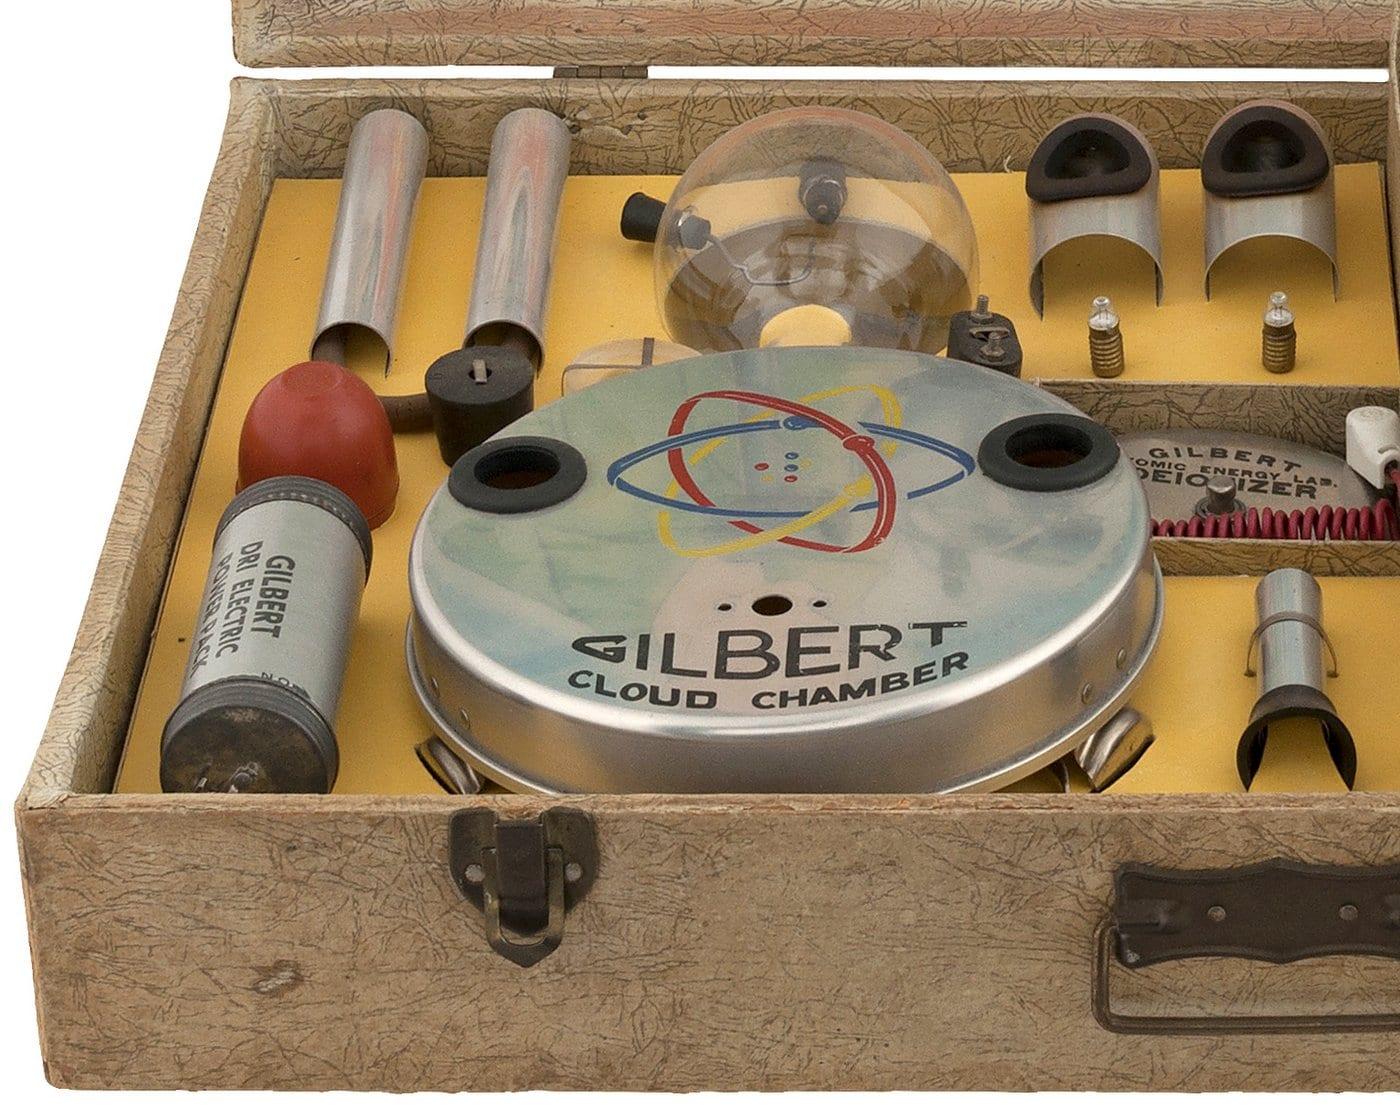 Gilbert nuclear physics atomic energy lab kit - Left side - 1950s